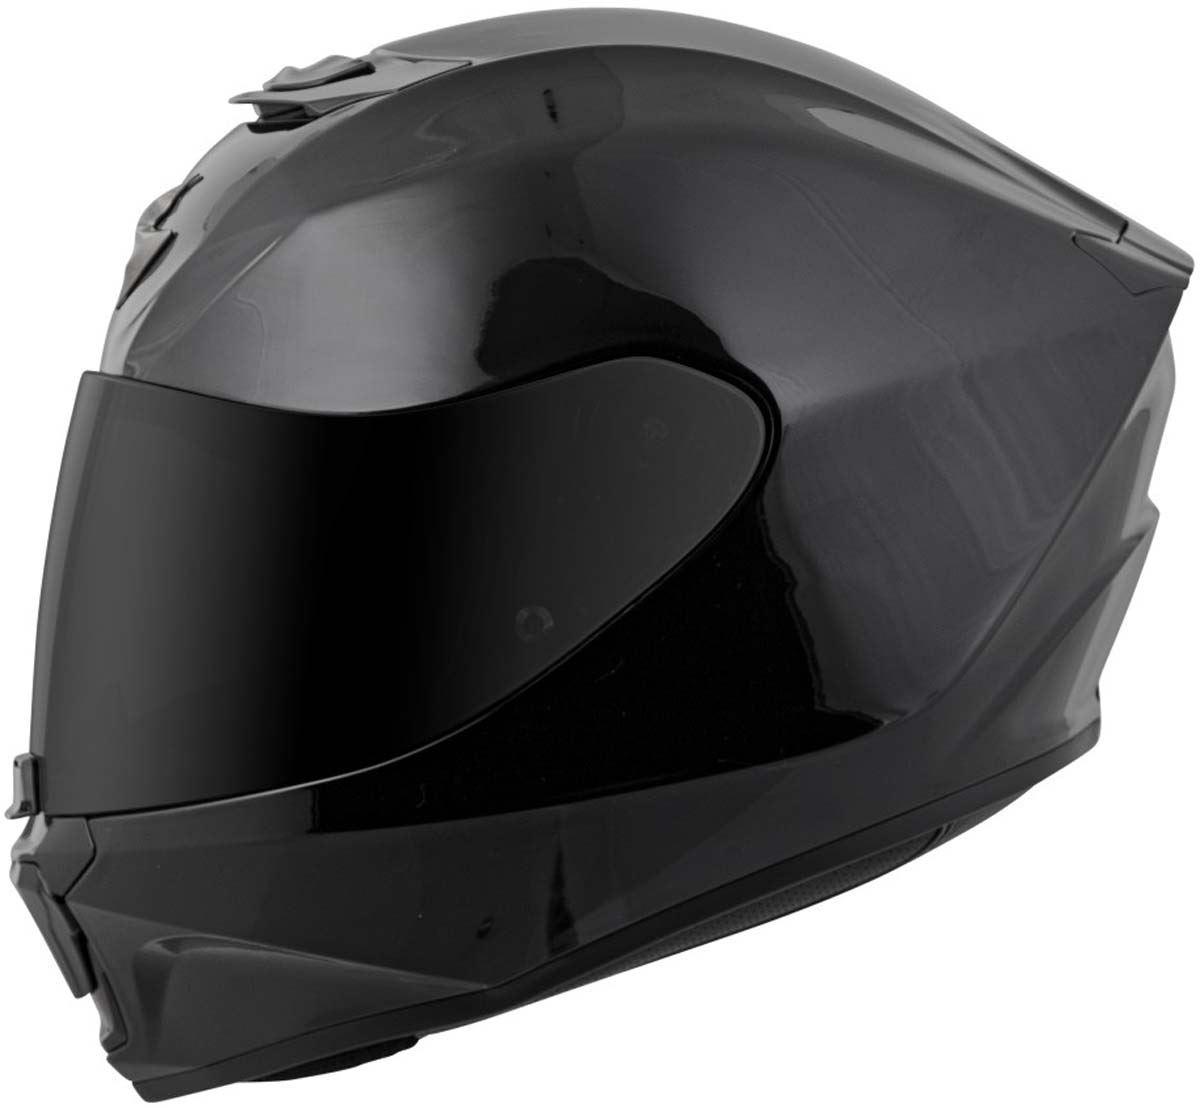 miniature 3 - Scorpion EXO-R420 Helmet Removable Liner Air Flow DOT SNELL M2015 XS-2XL